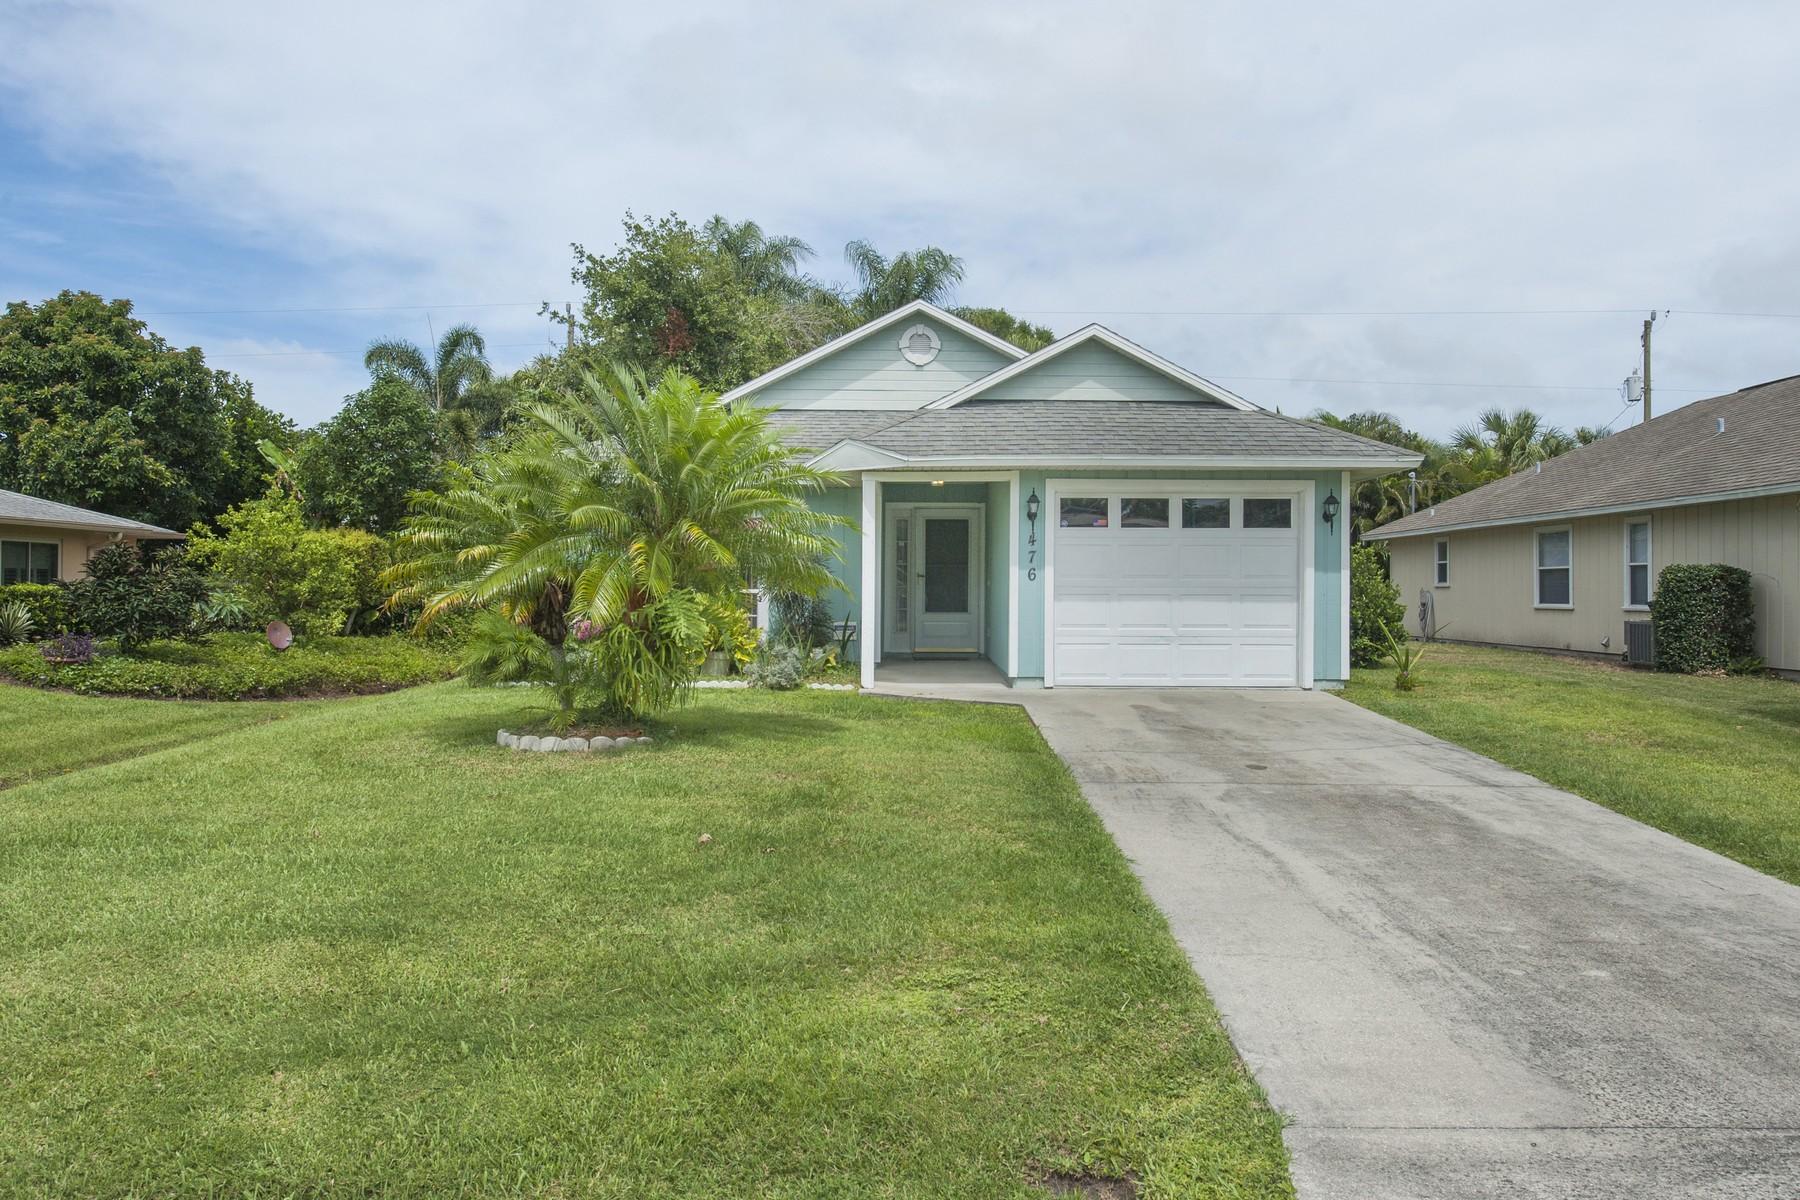 Casa para uma família para Venda às Lovely home in Royal Poinciana Park 476 14th Avenue Vero Beach, Florida 32962 Estados Unidos